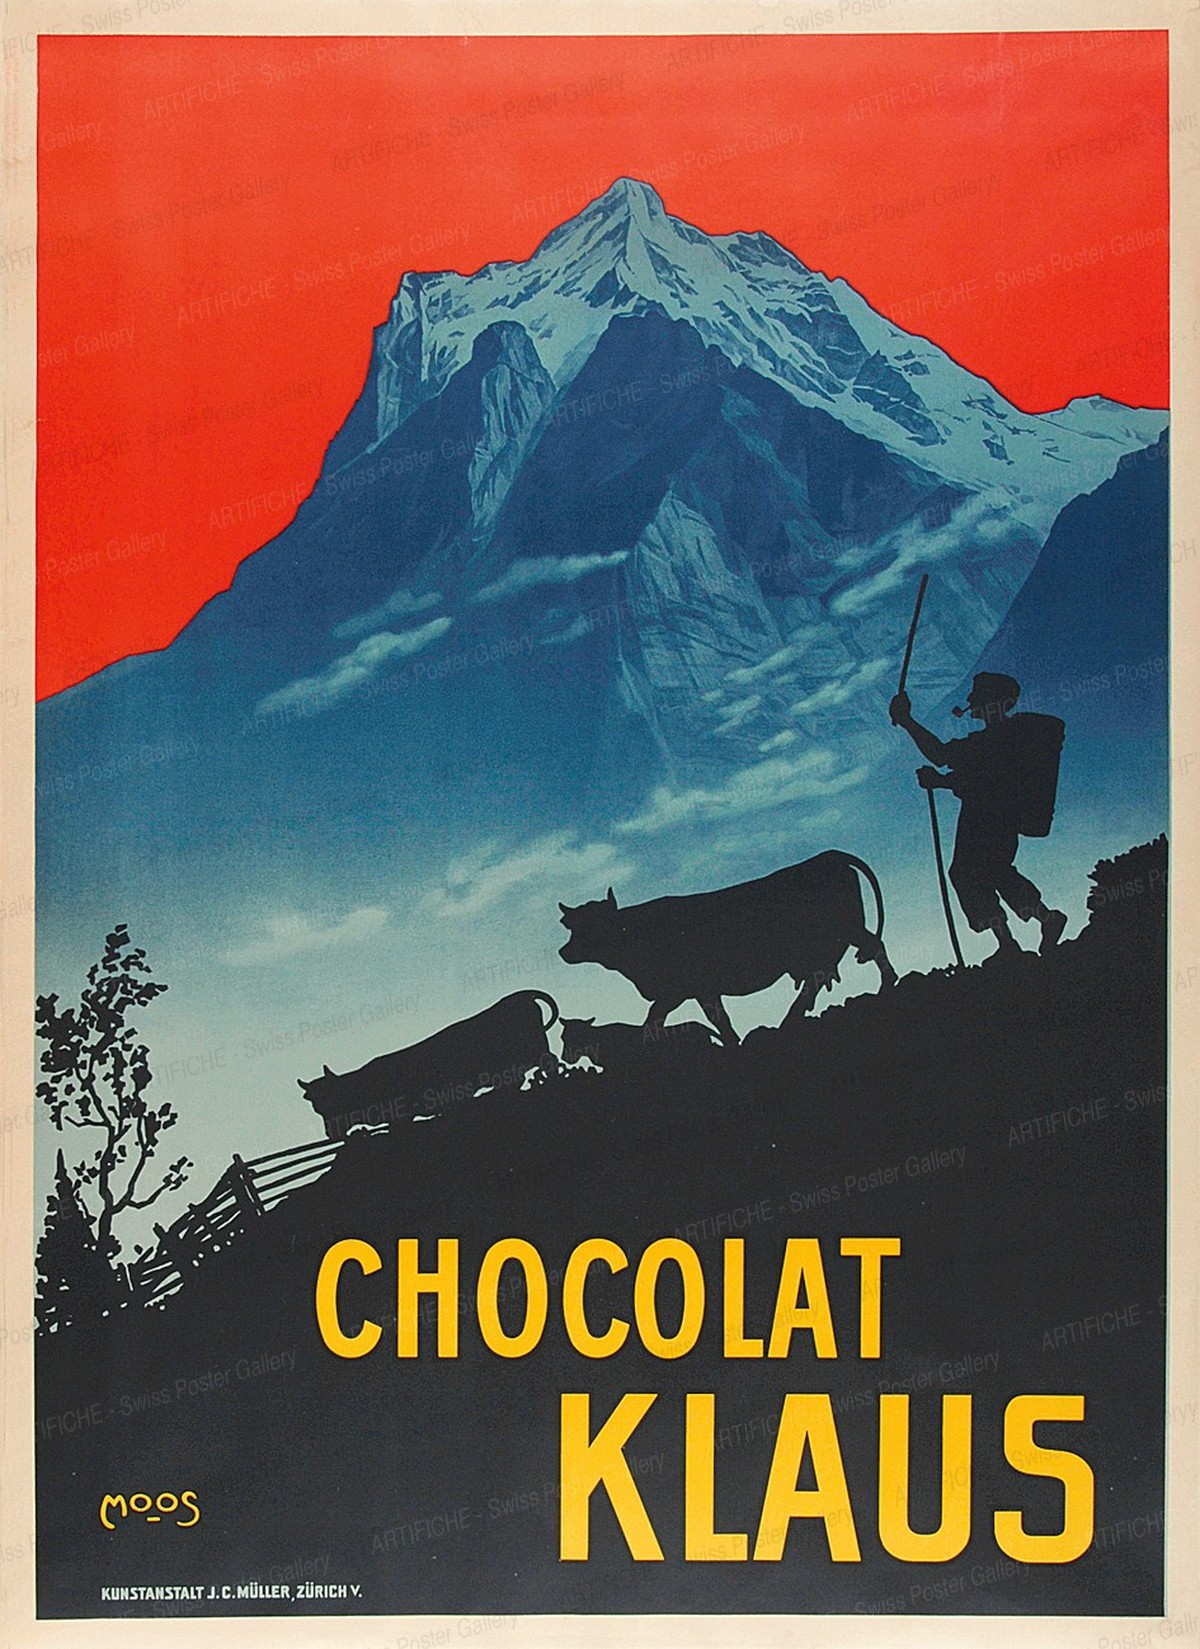 CHOCOLAT KLAUS, Carl Franz Moos